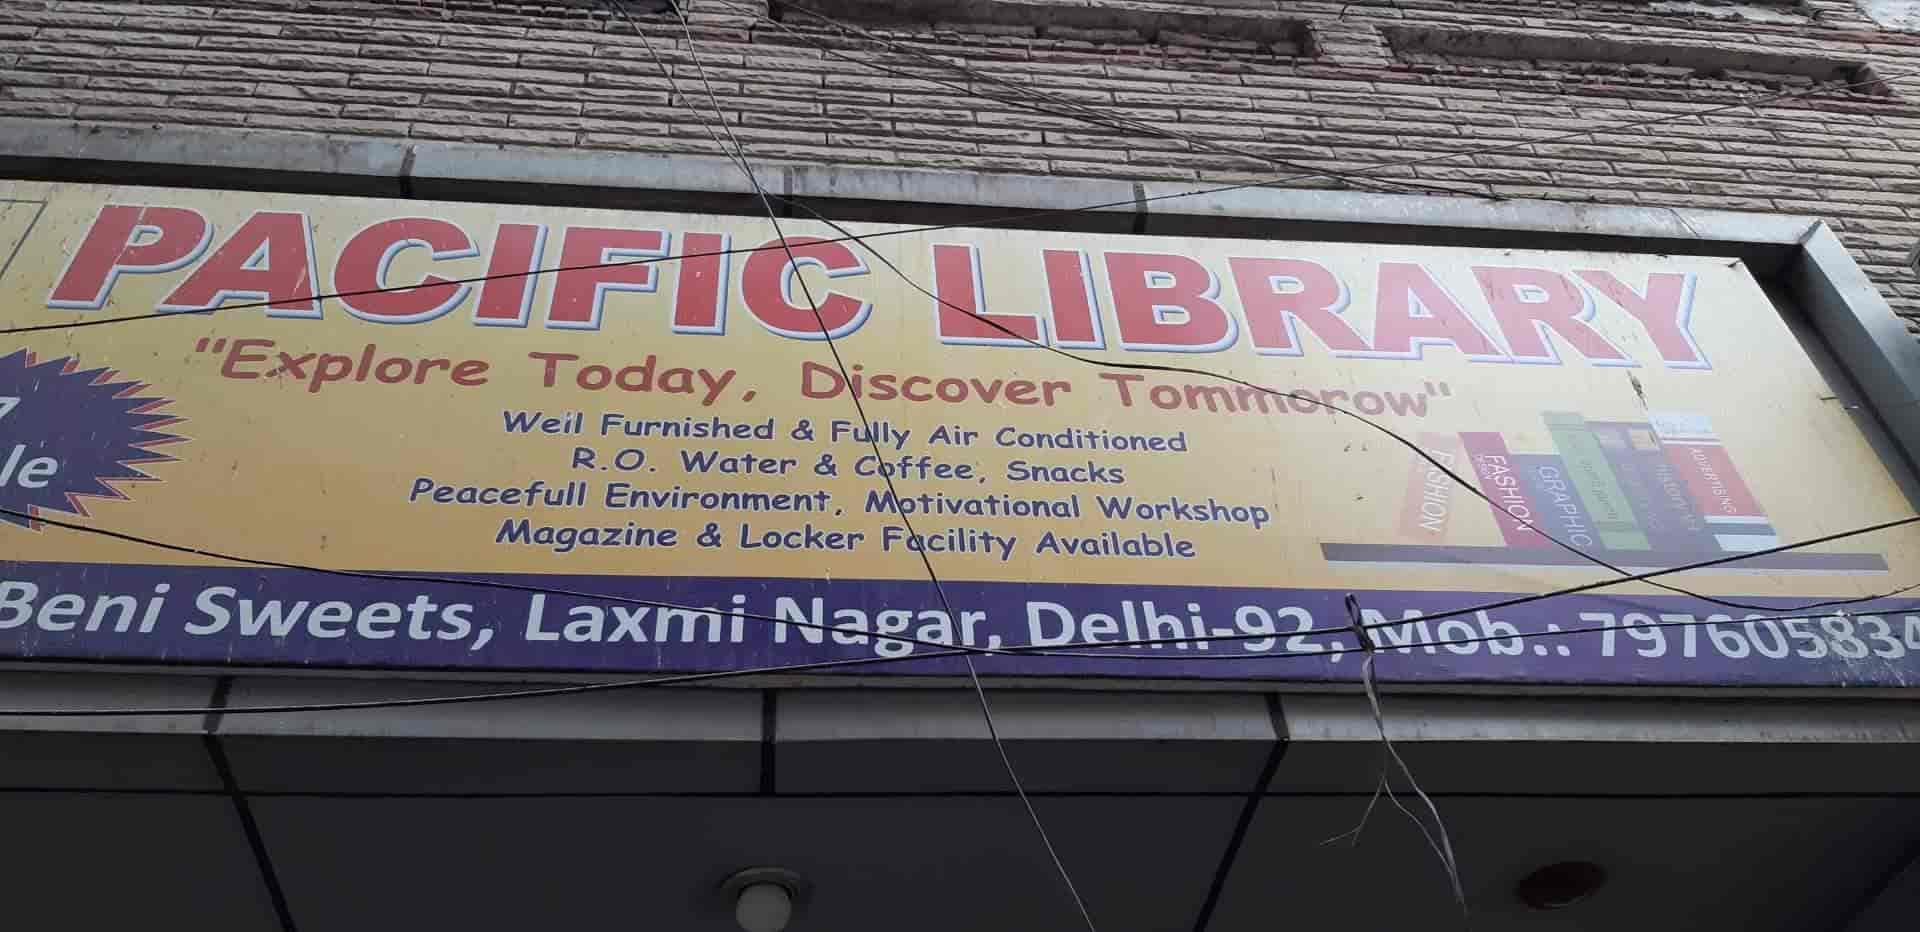 Pacific Library, Laxmi Nagar - Libraries in Delhi - Justdial